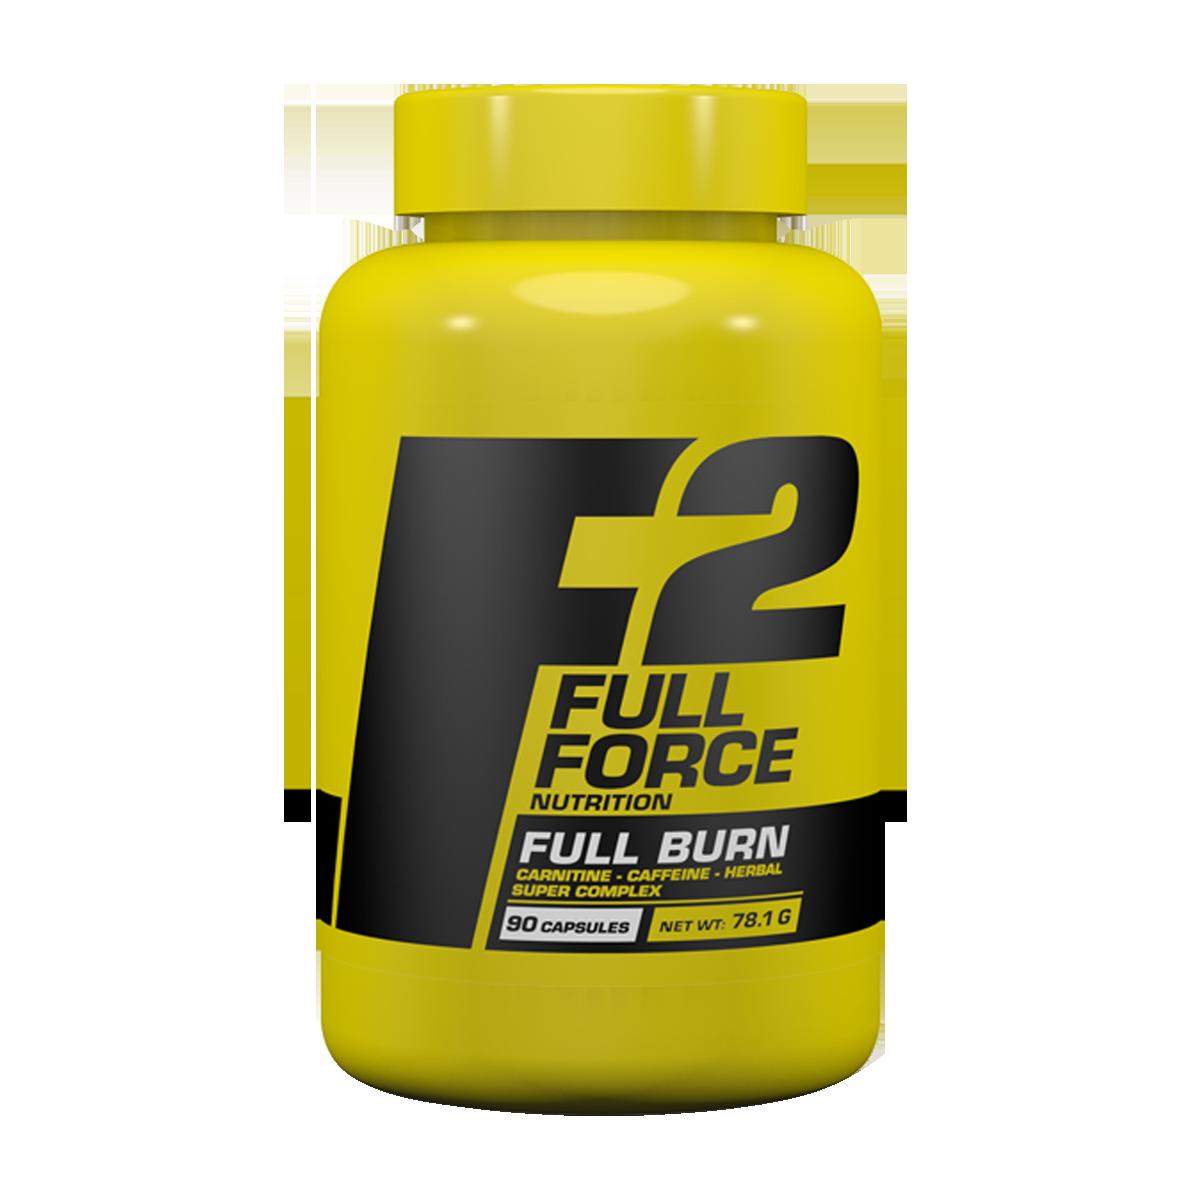 Full-Force-Nutrition-Full-Burn-90-Caps-BC00080FFN-1200x1200.png